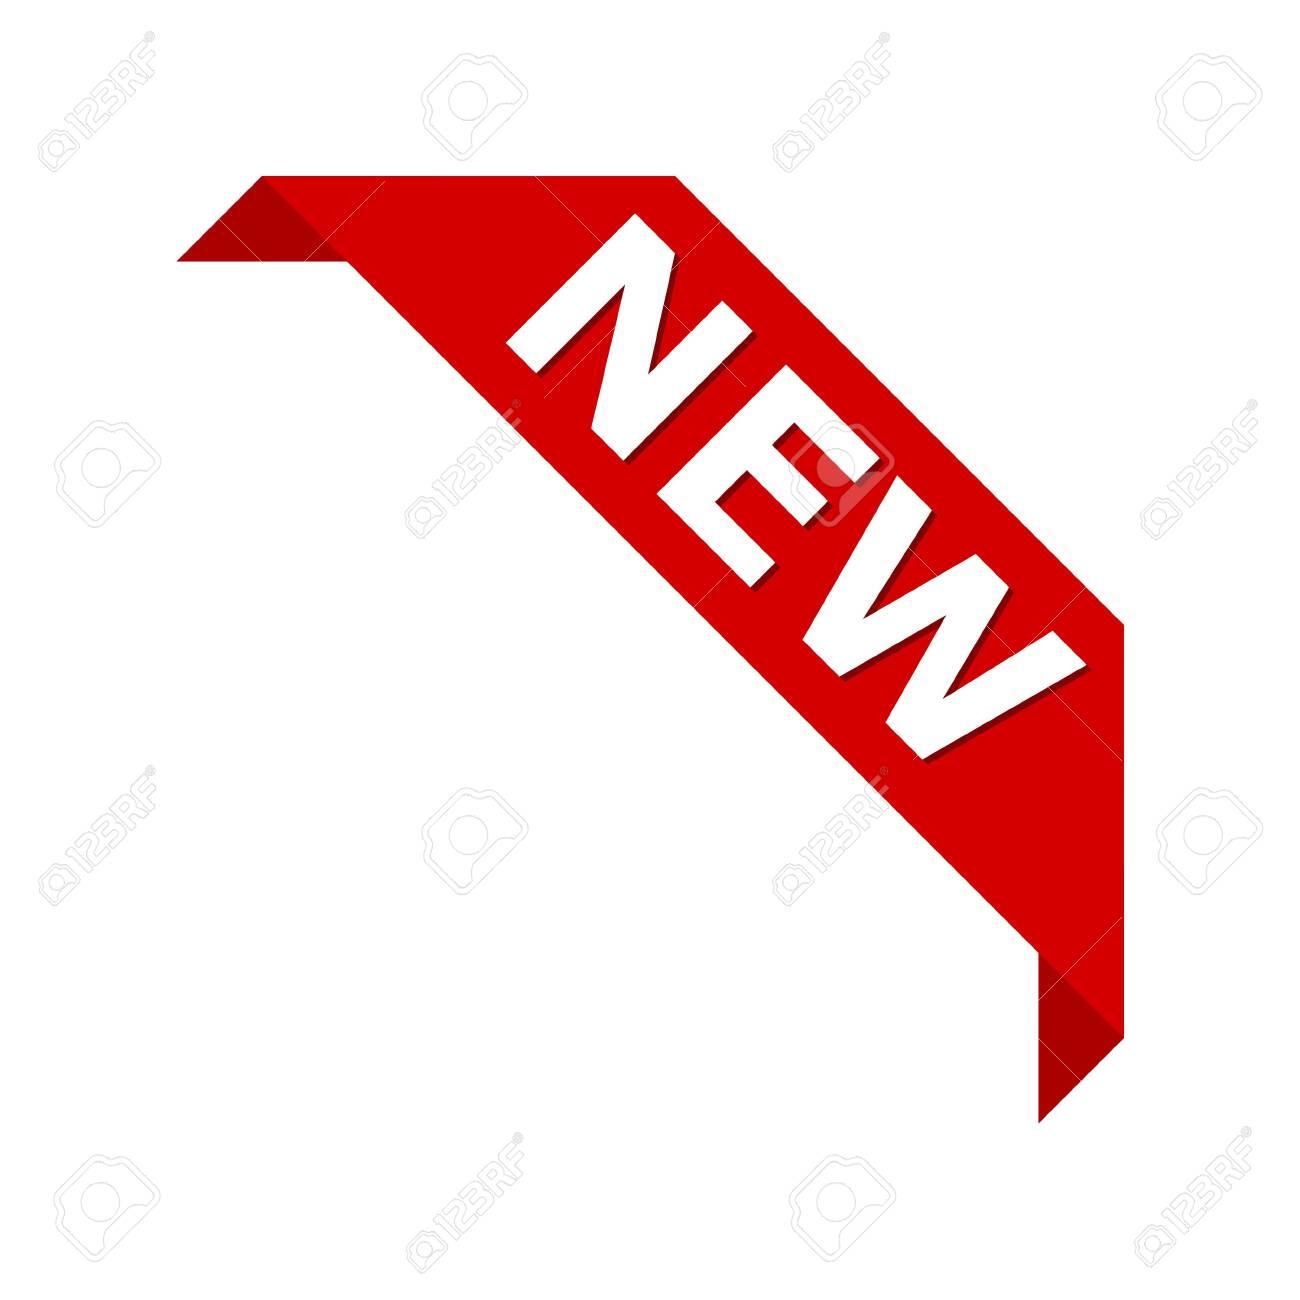 New product corner ribbon banner label vector icon - 143235621